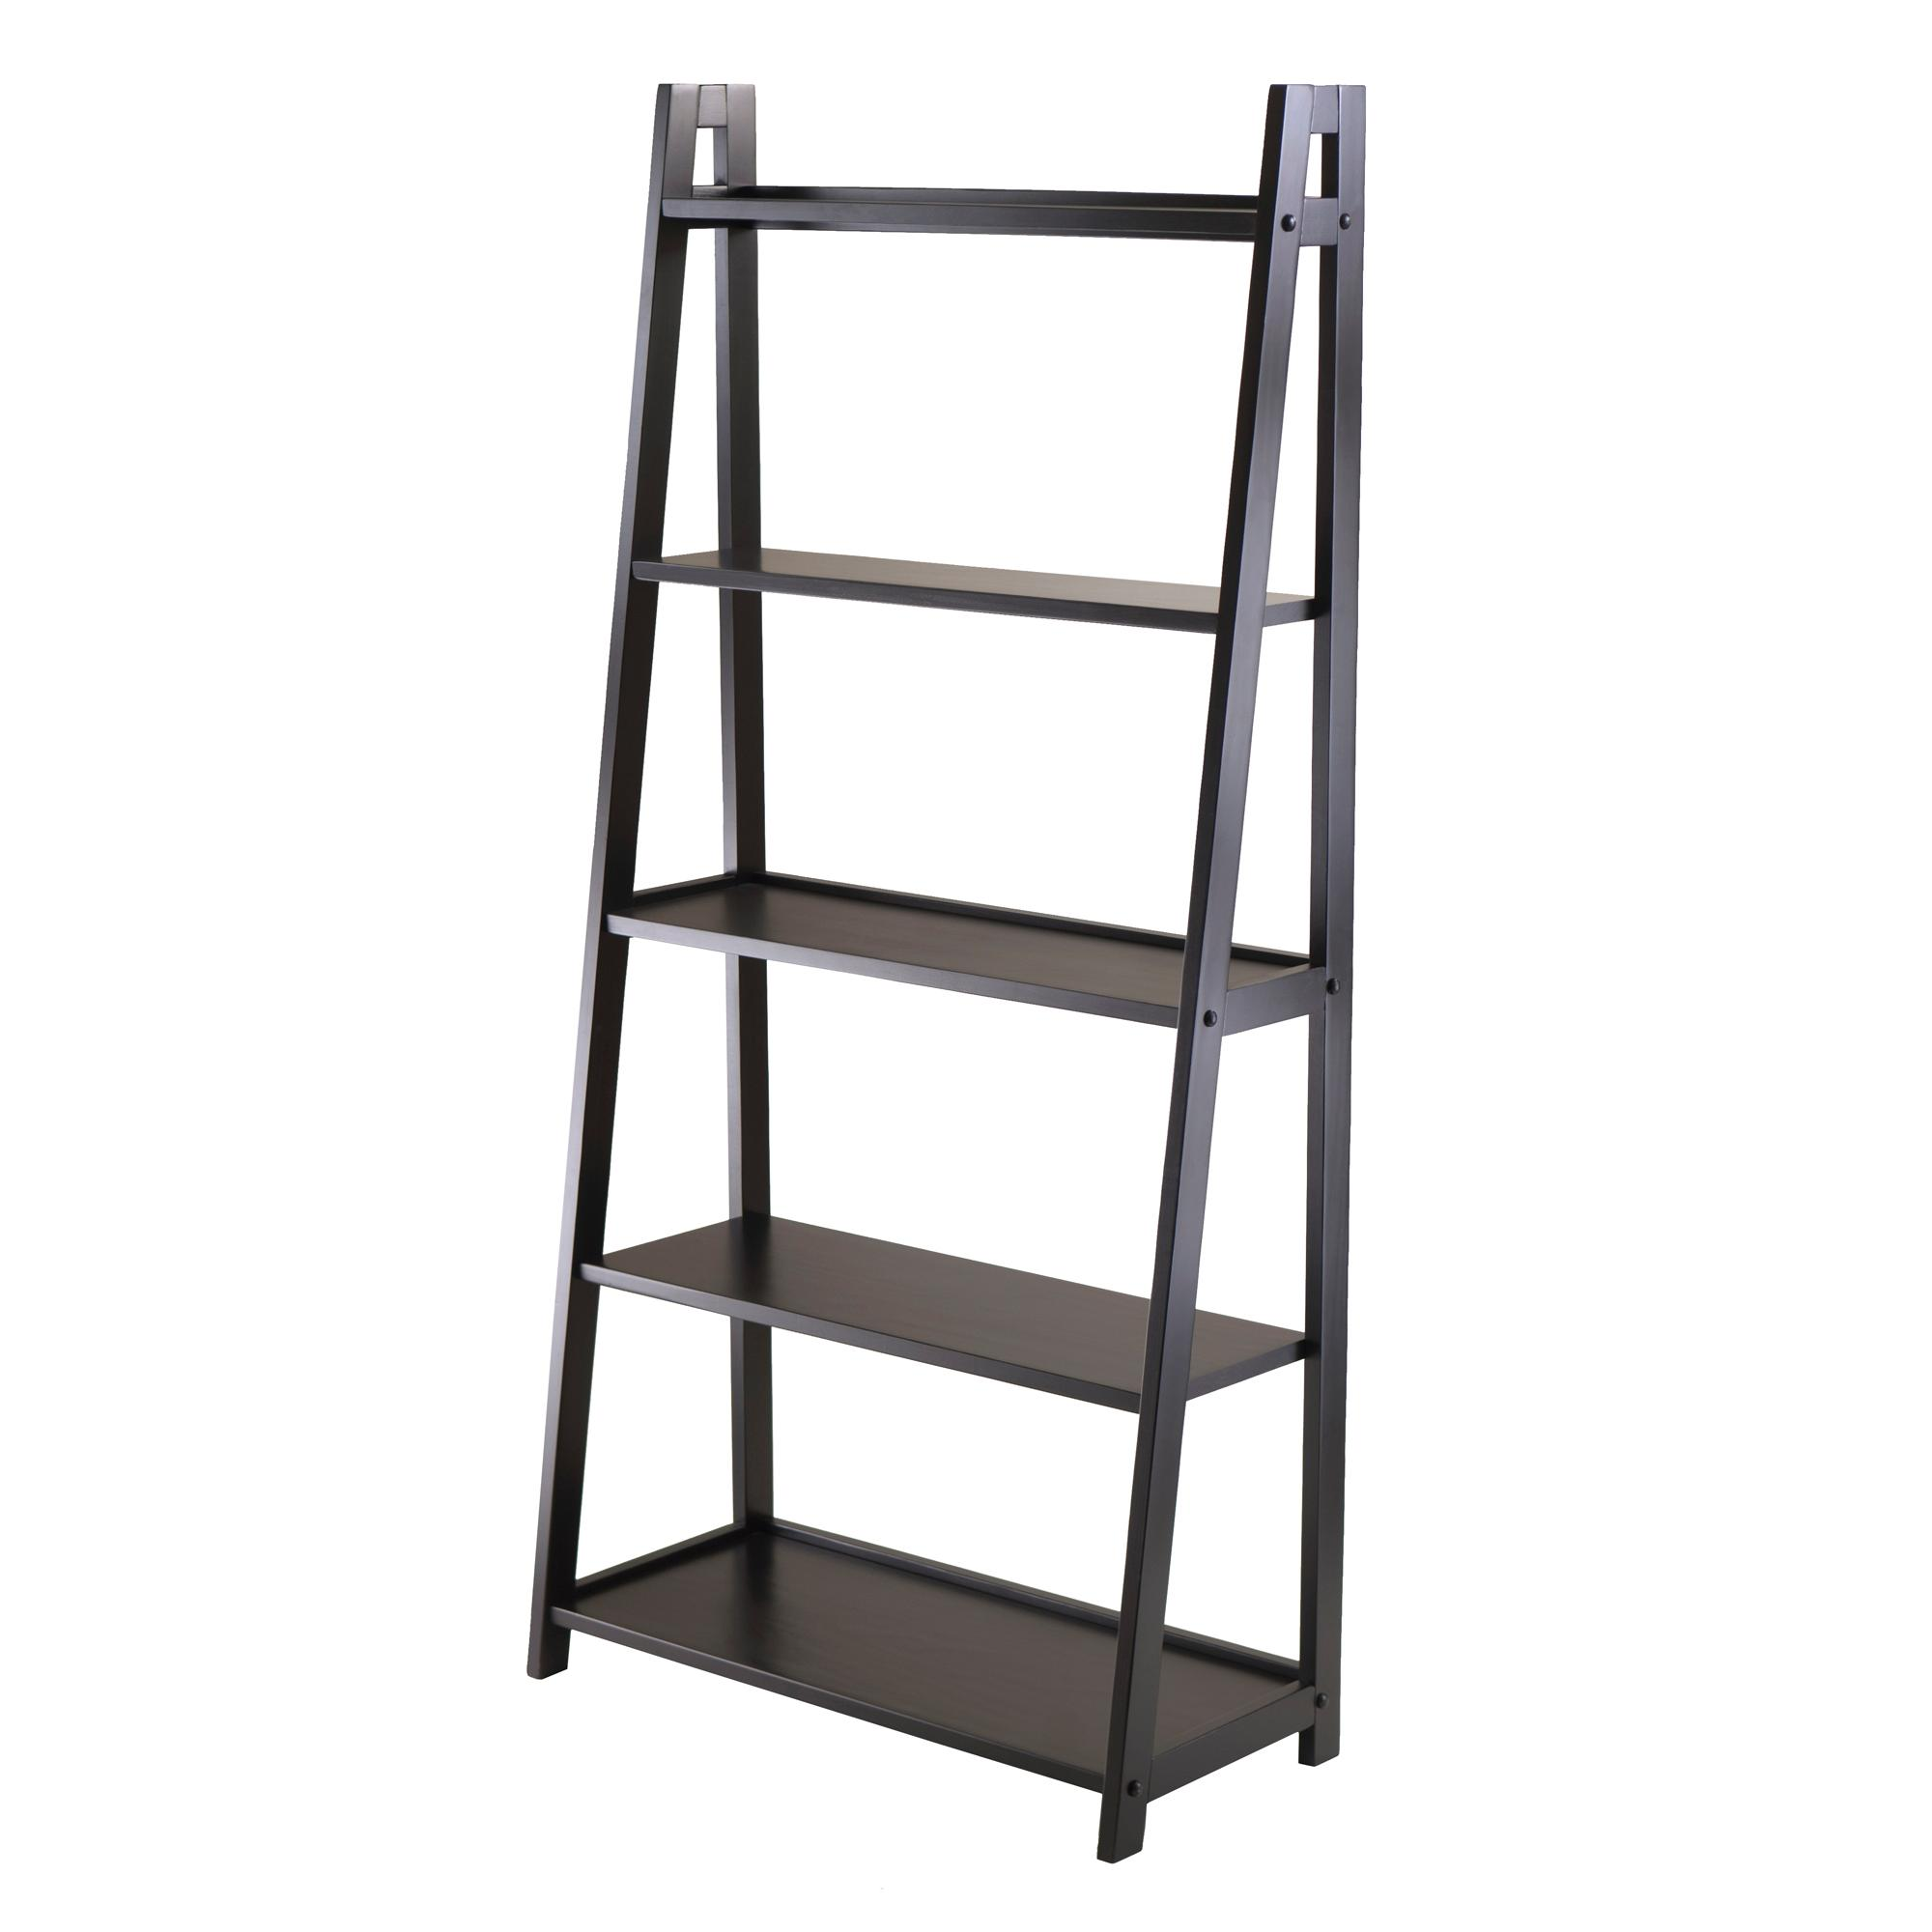 Amazon.com: Winsome Adam 5-Tier A-Frame Shelf: Kitchen & Dining